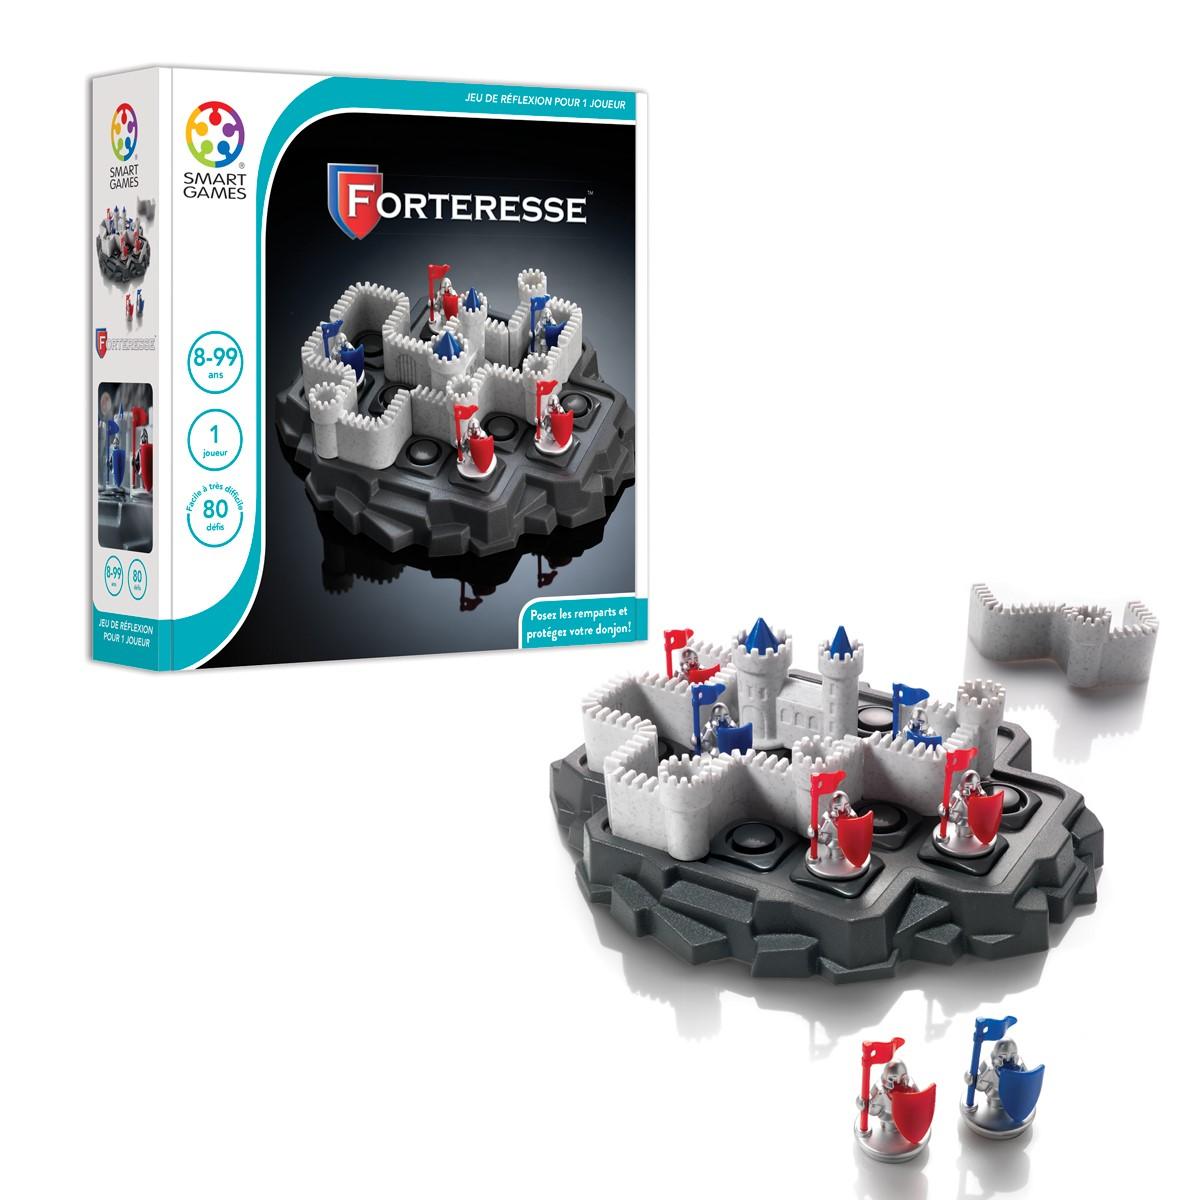 forteresse-smartgames-box